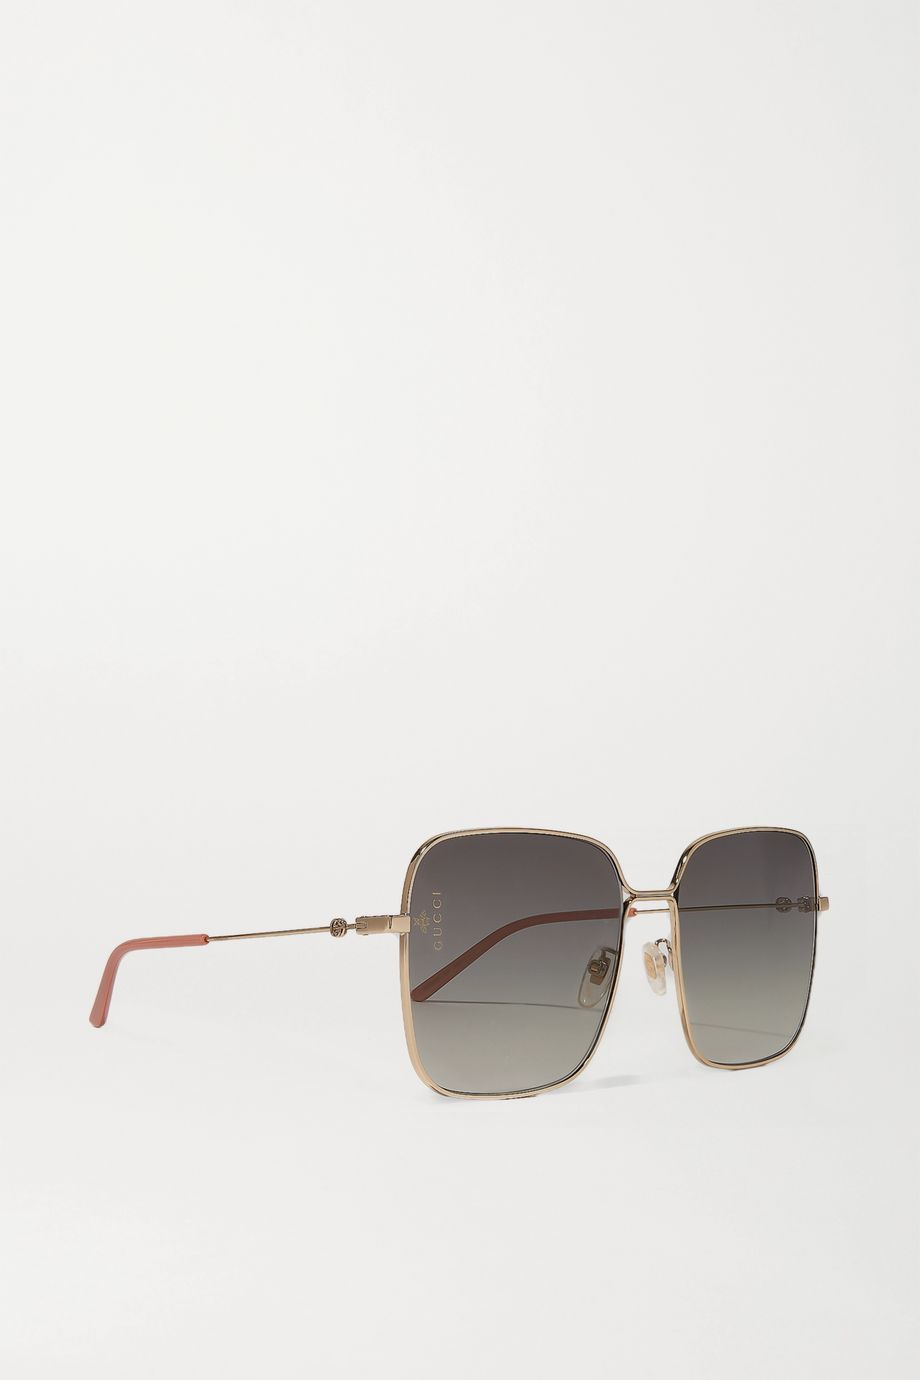 Gucci Goldfarbene Oversized-Sonnenbrille mit eckigem Rahmen